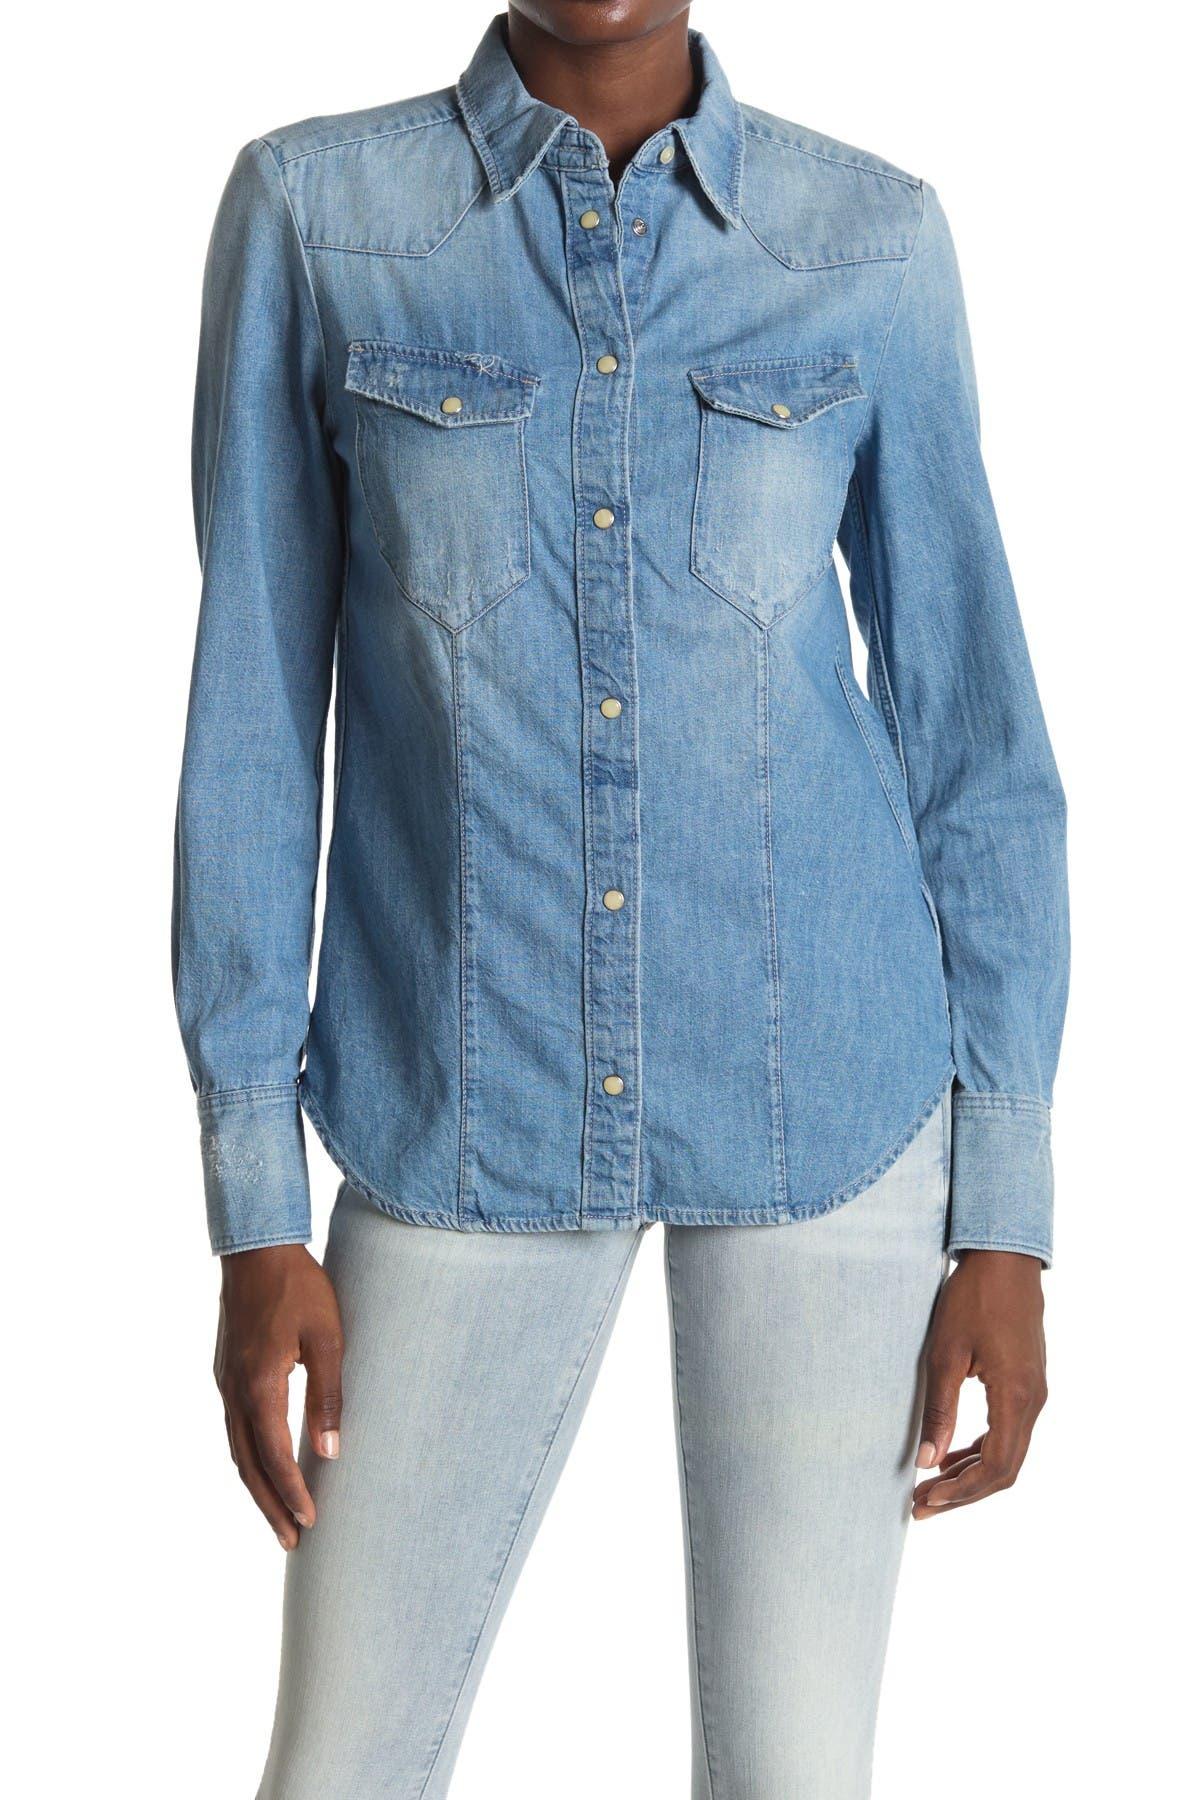 Image of G-STAR RAW Tacoma Straight Denim Shirt